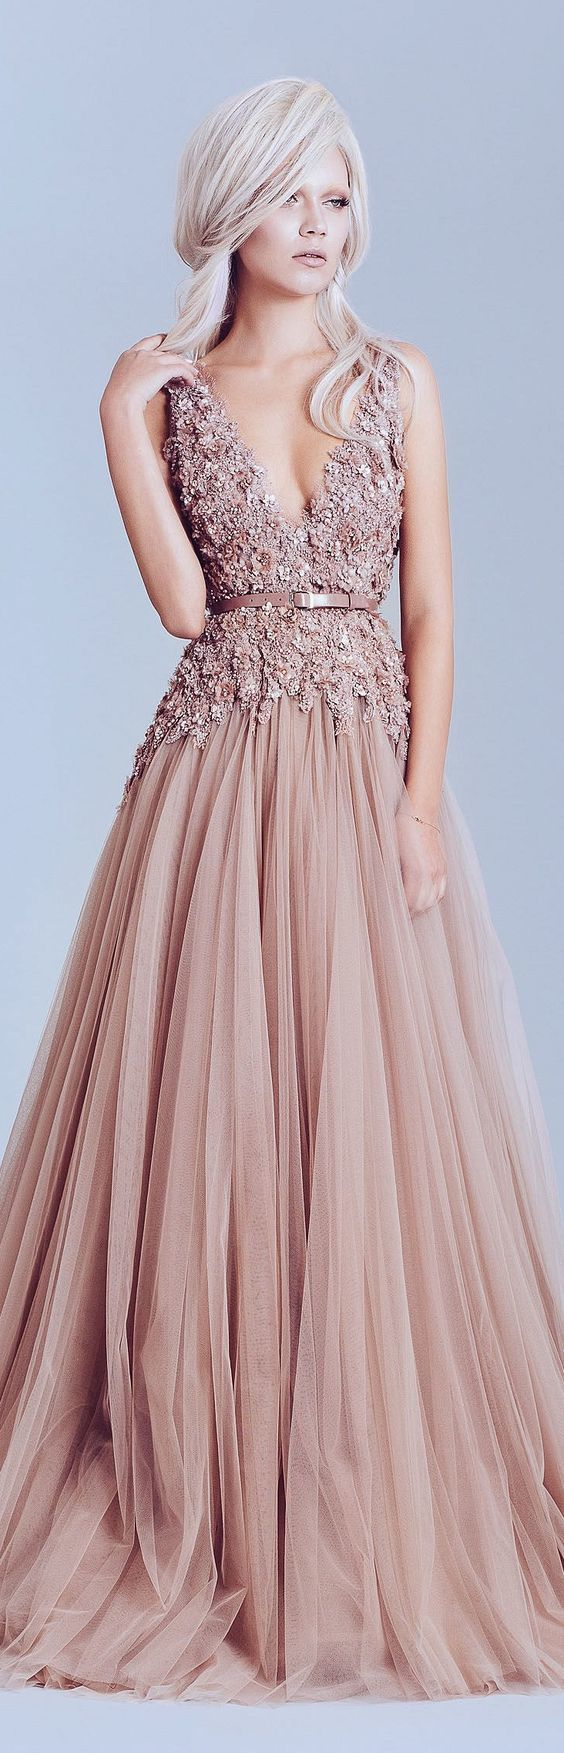 Платье розовое из фатина